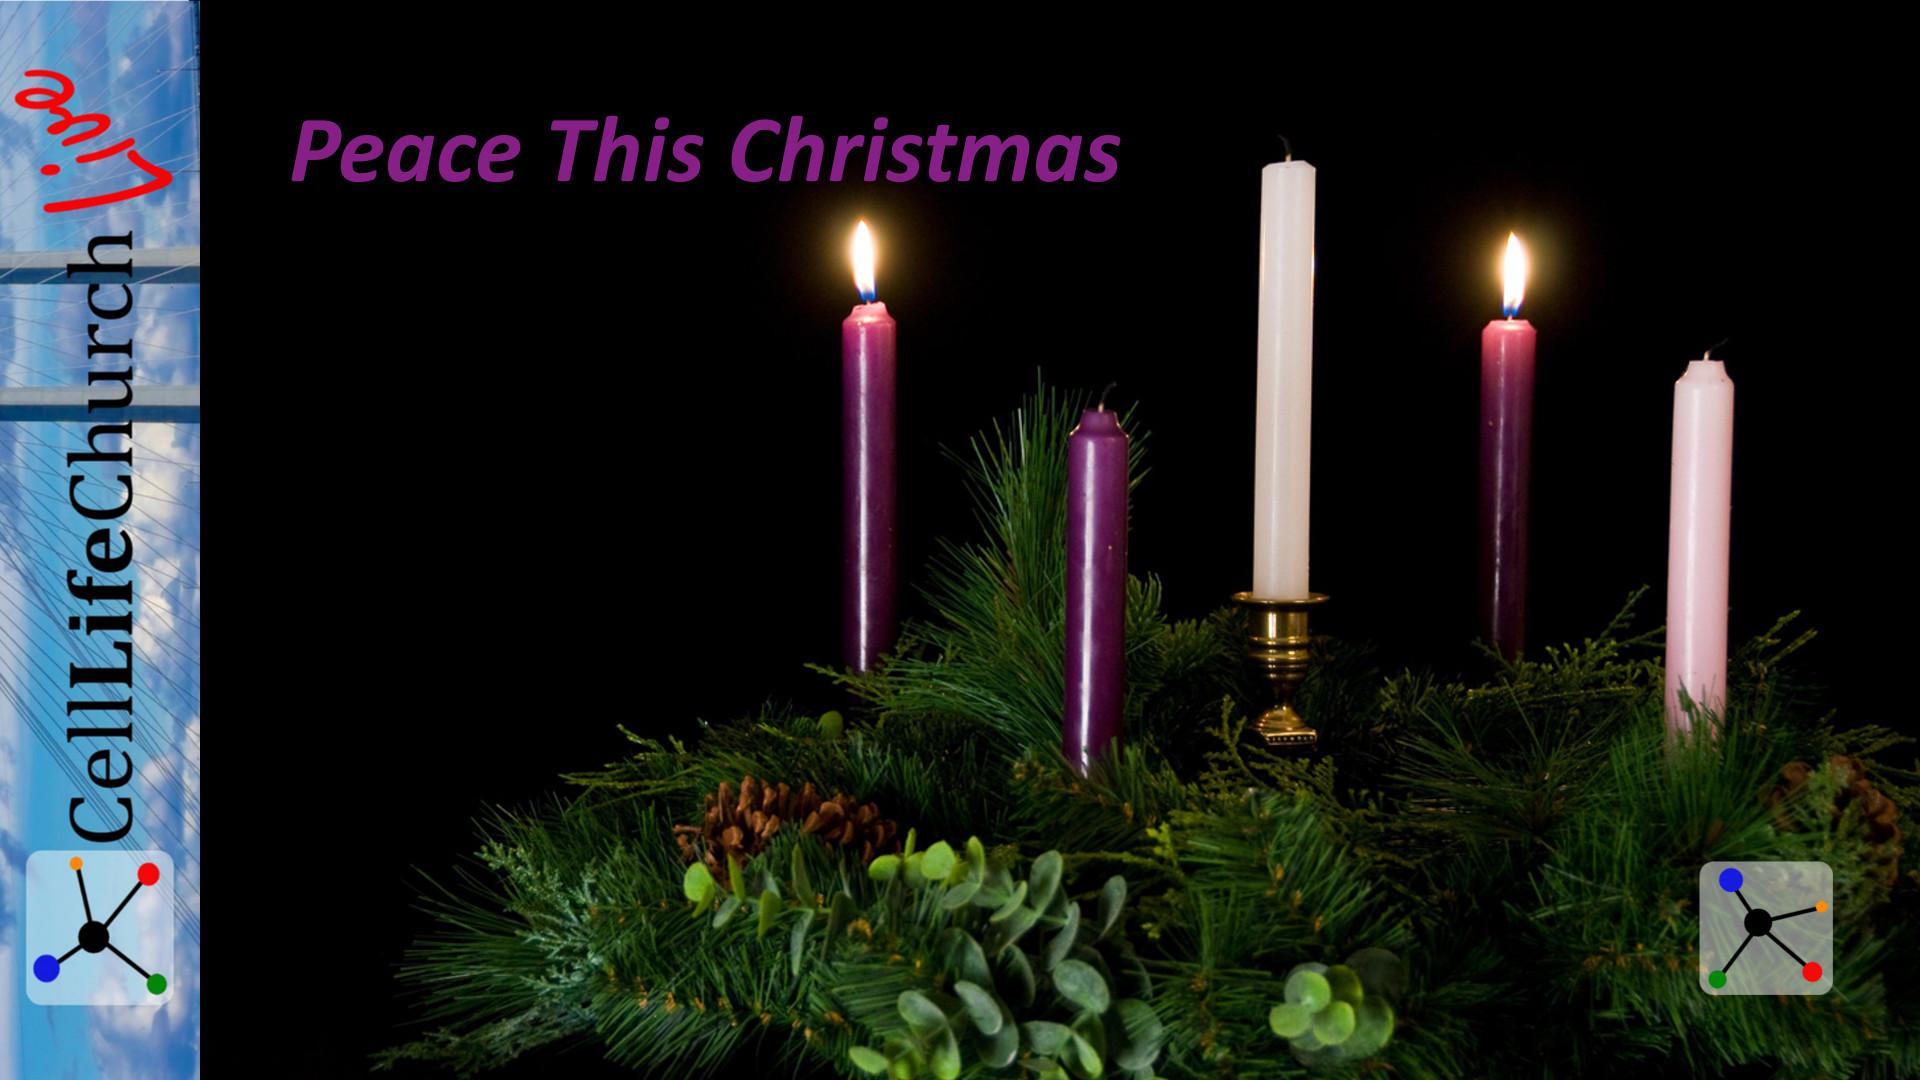 Peace This Christmas